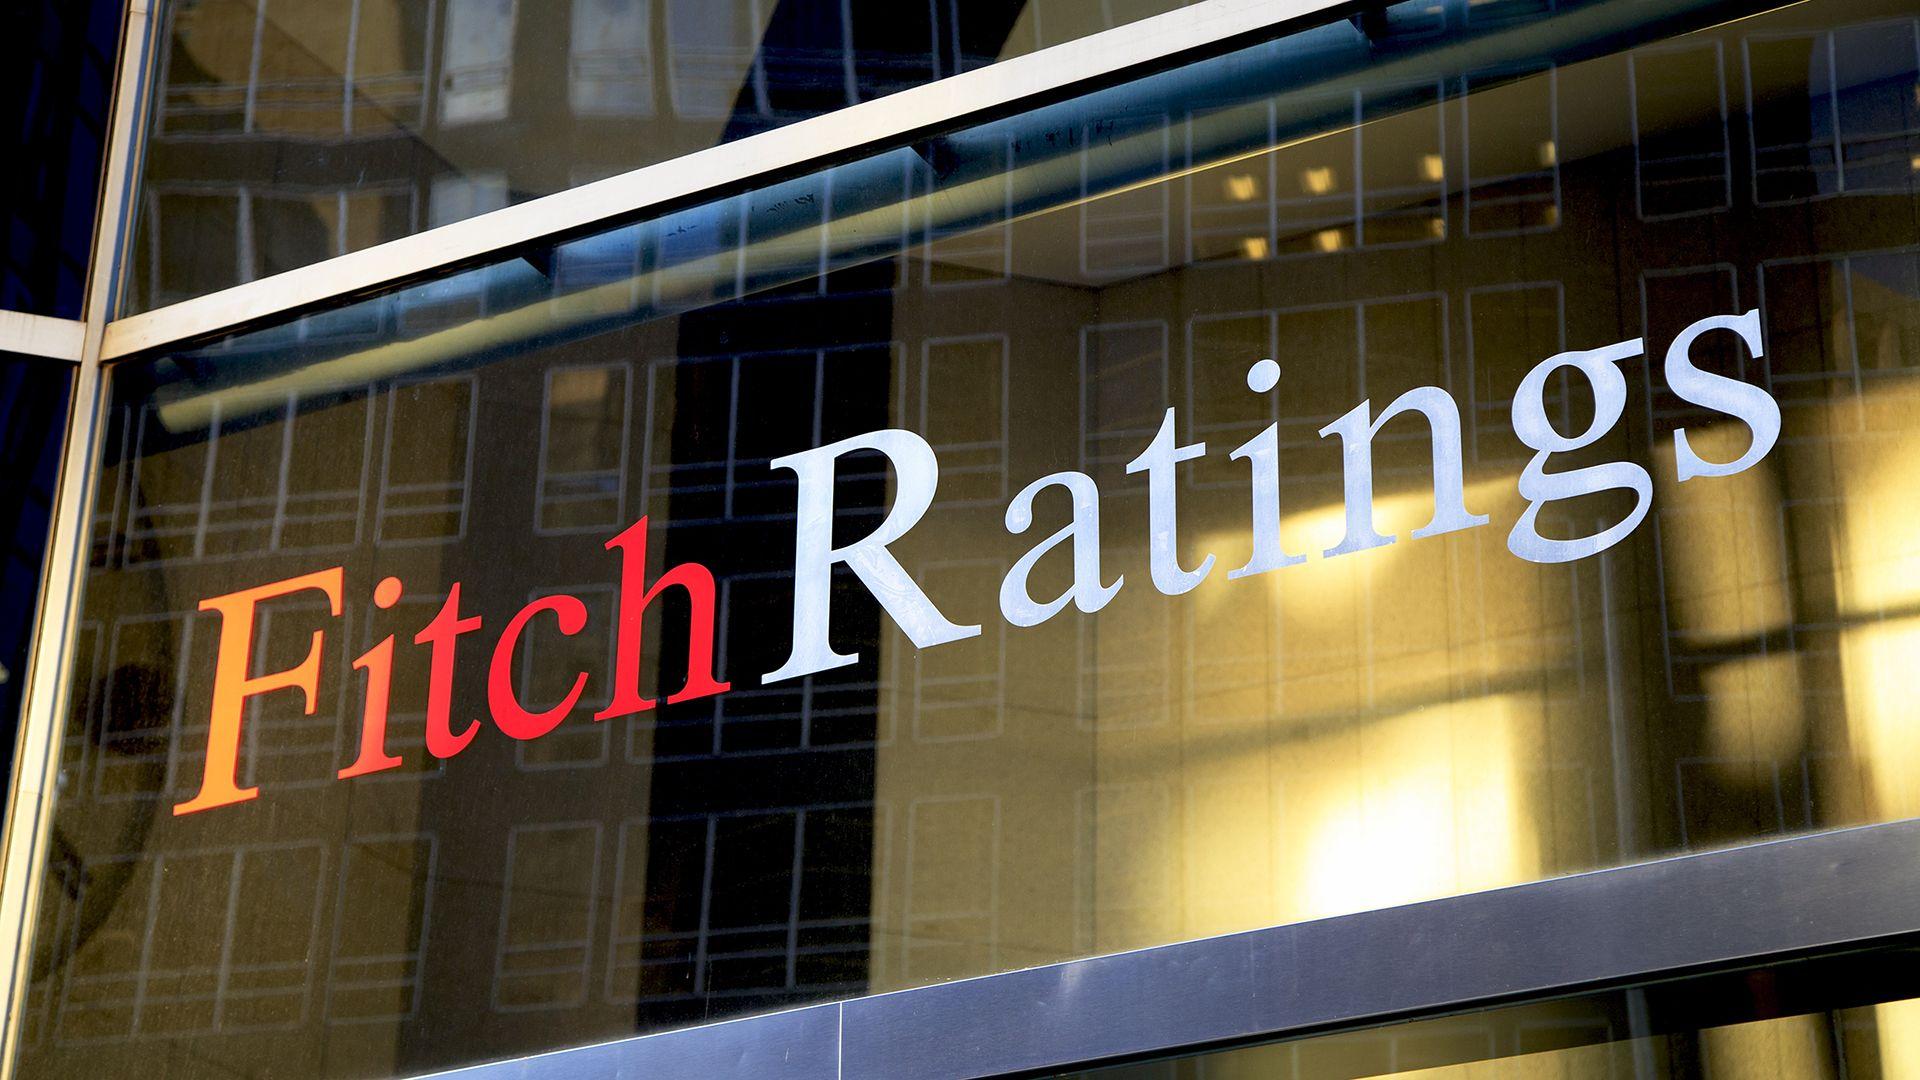 Fitch Ratings подтвердило кредитный рейтинг Казахстана на уровне «BBB»- Kapital.kz